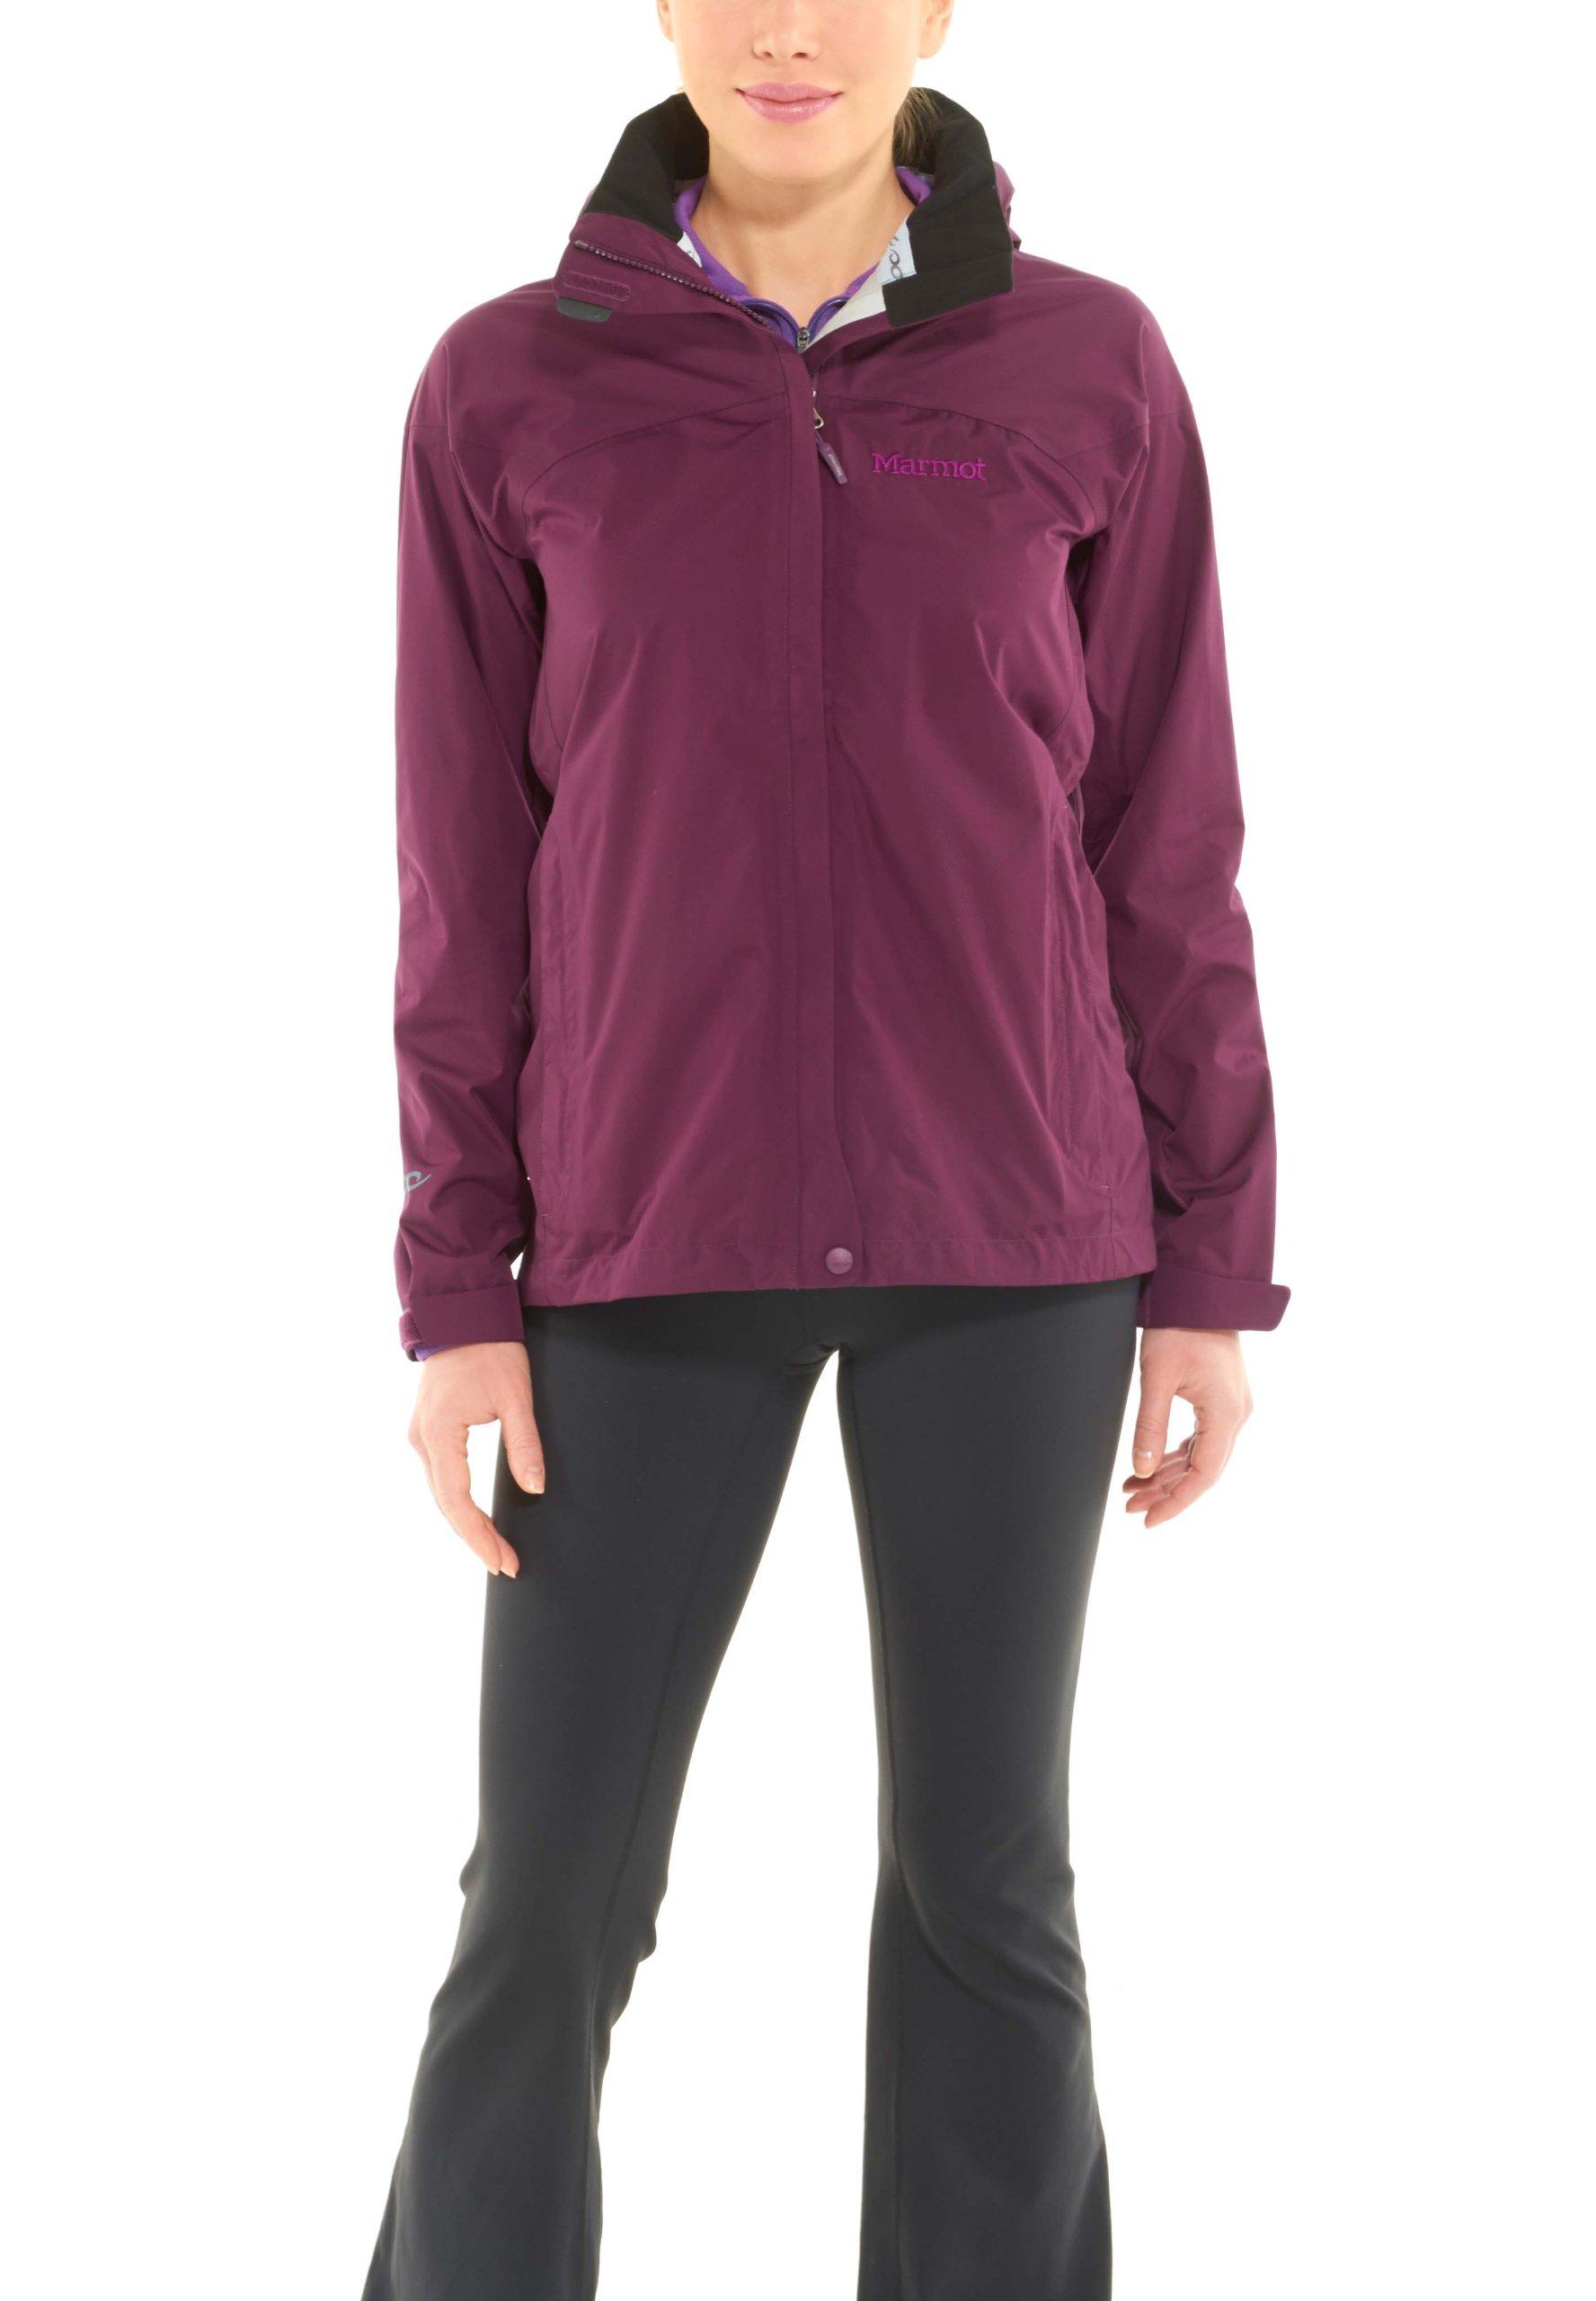 Marmot Phoenix Jacket Womens1261 Style: 1261-6765 Size: XL by Marmot